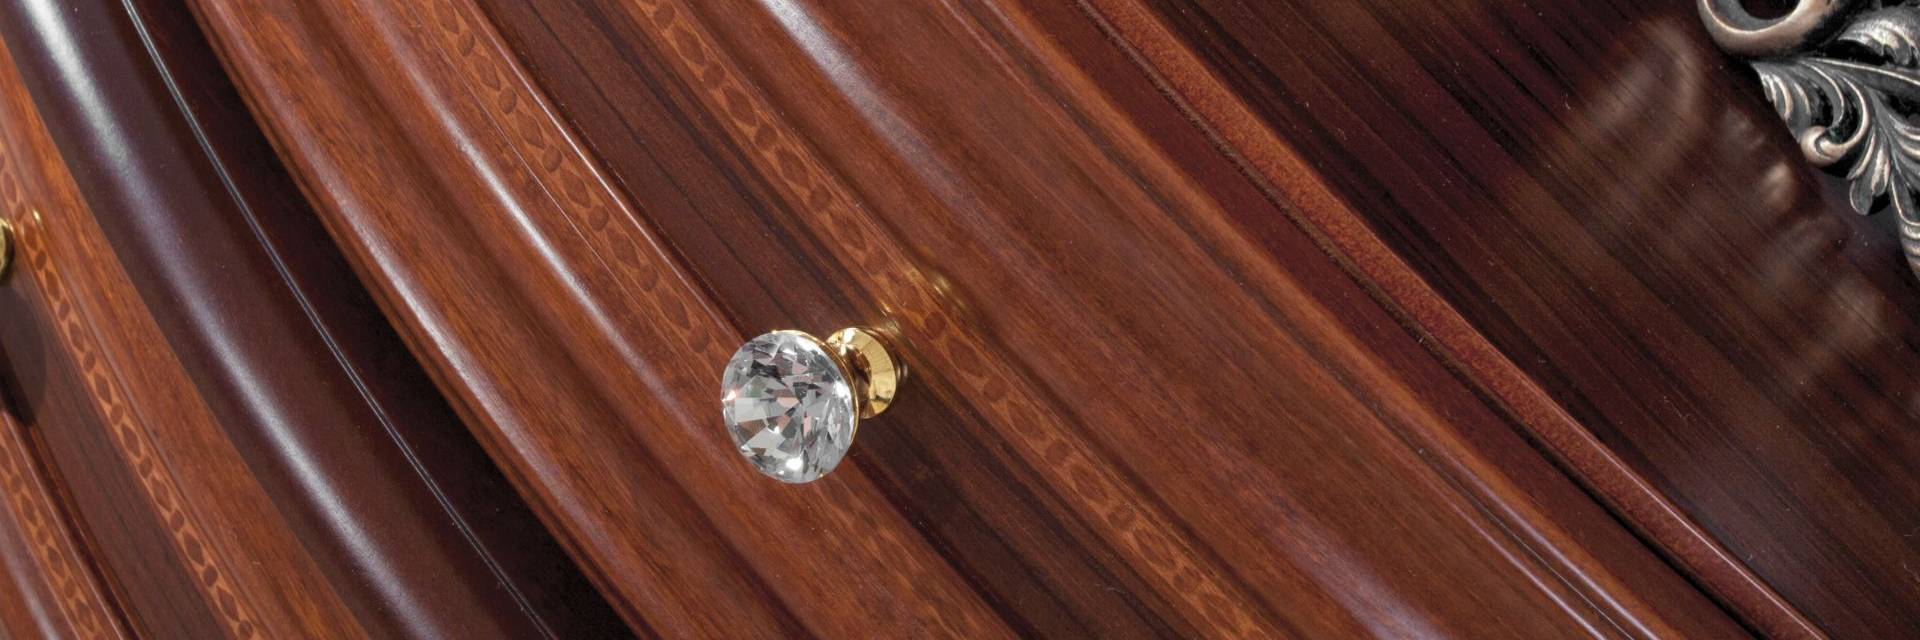 kolekcja mebli Diament szafka - meble Diament